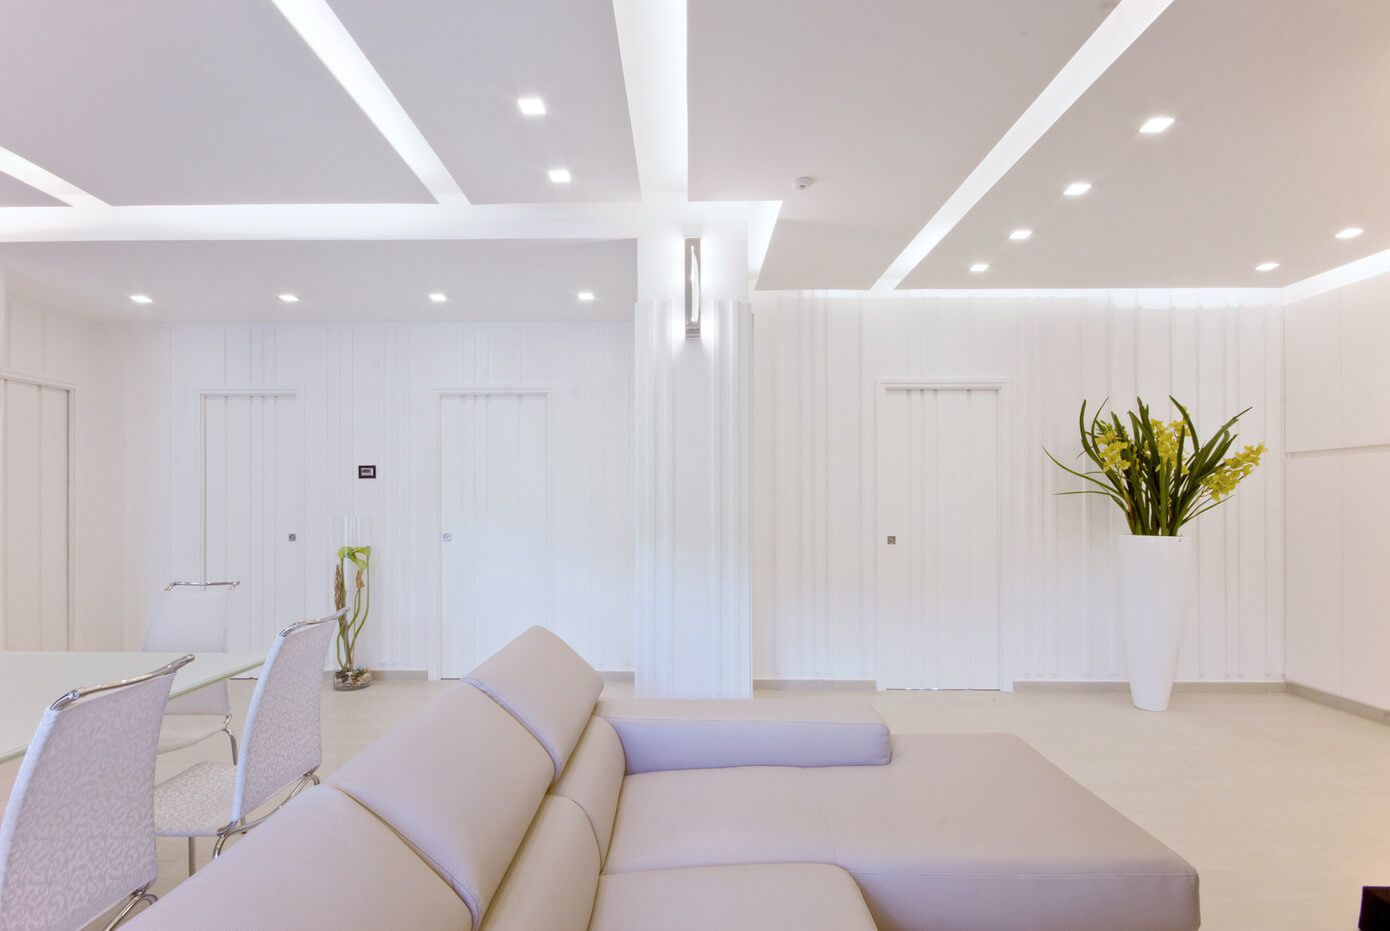 Interior-I--by-b2c-architects-07